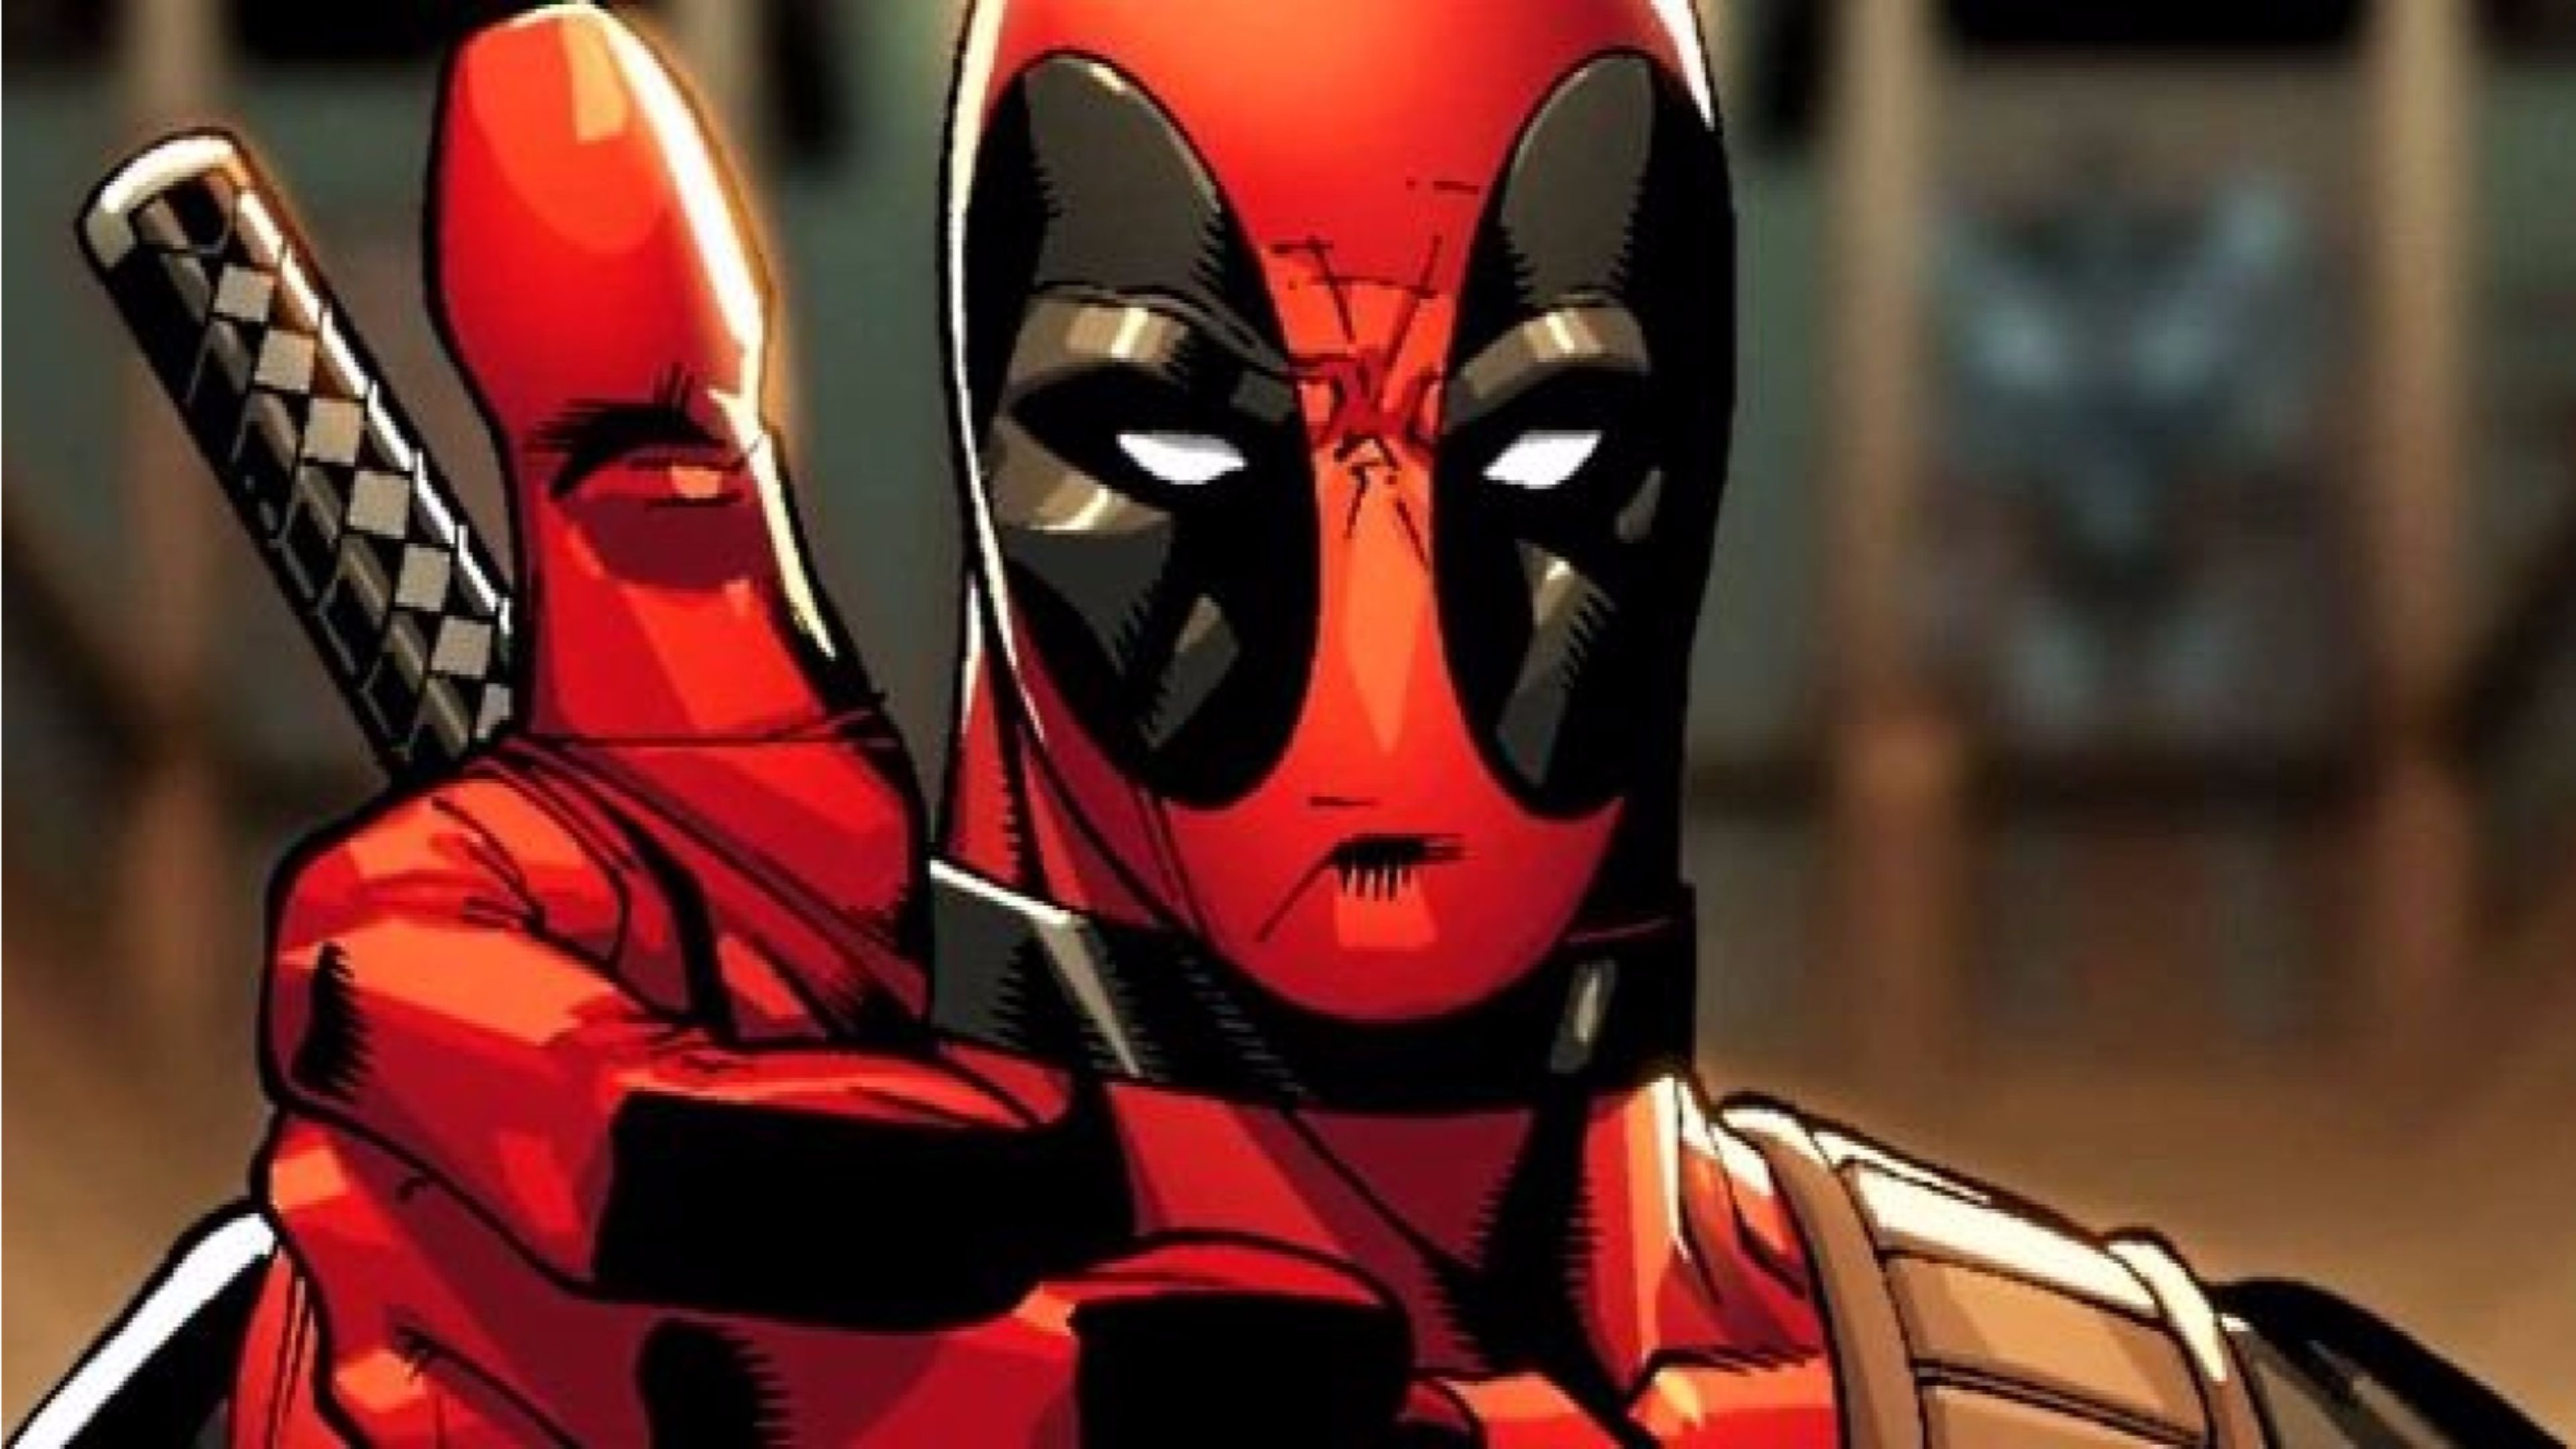 Free Download Kids Cartoon Deadpool Movie 4k Wallpaper 4k